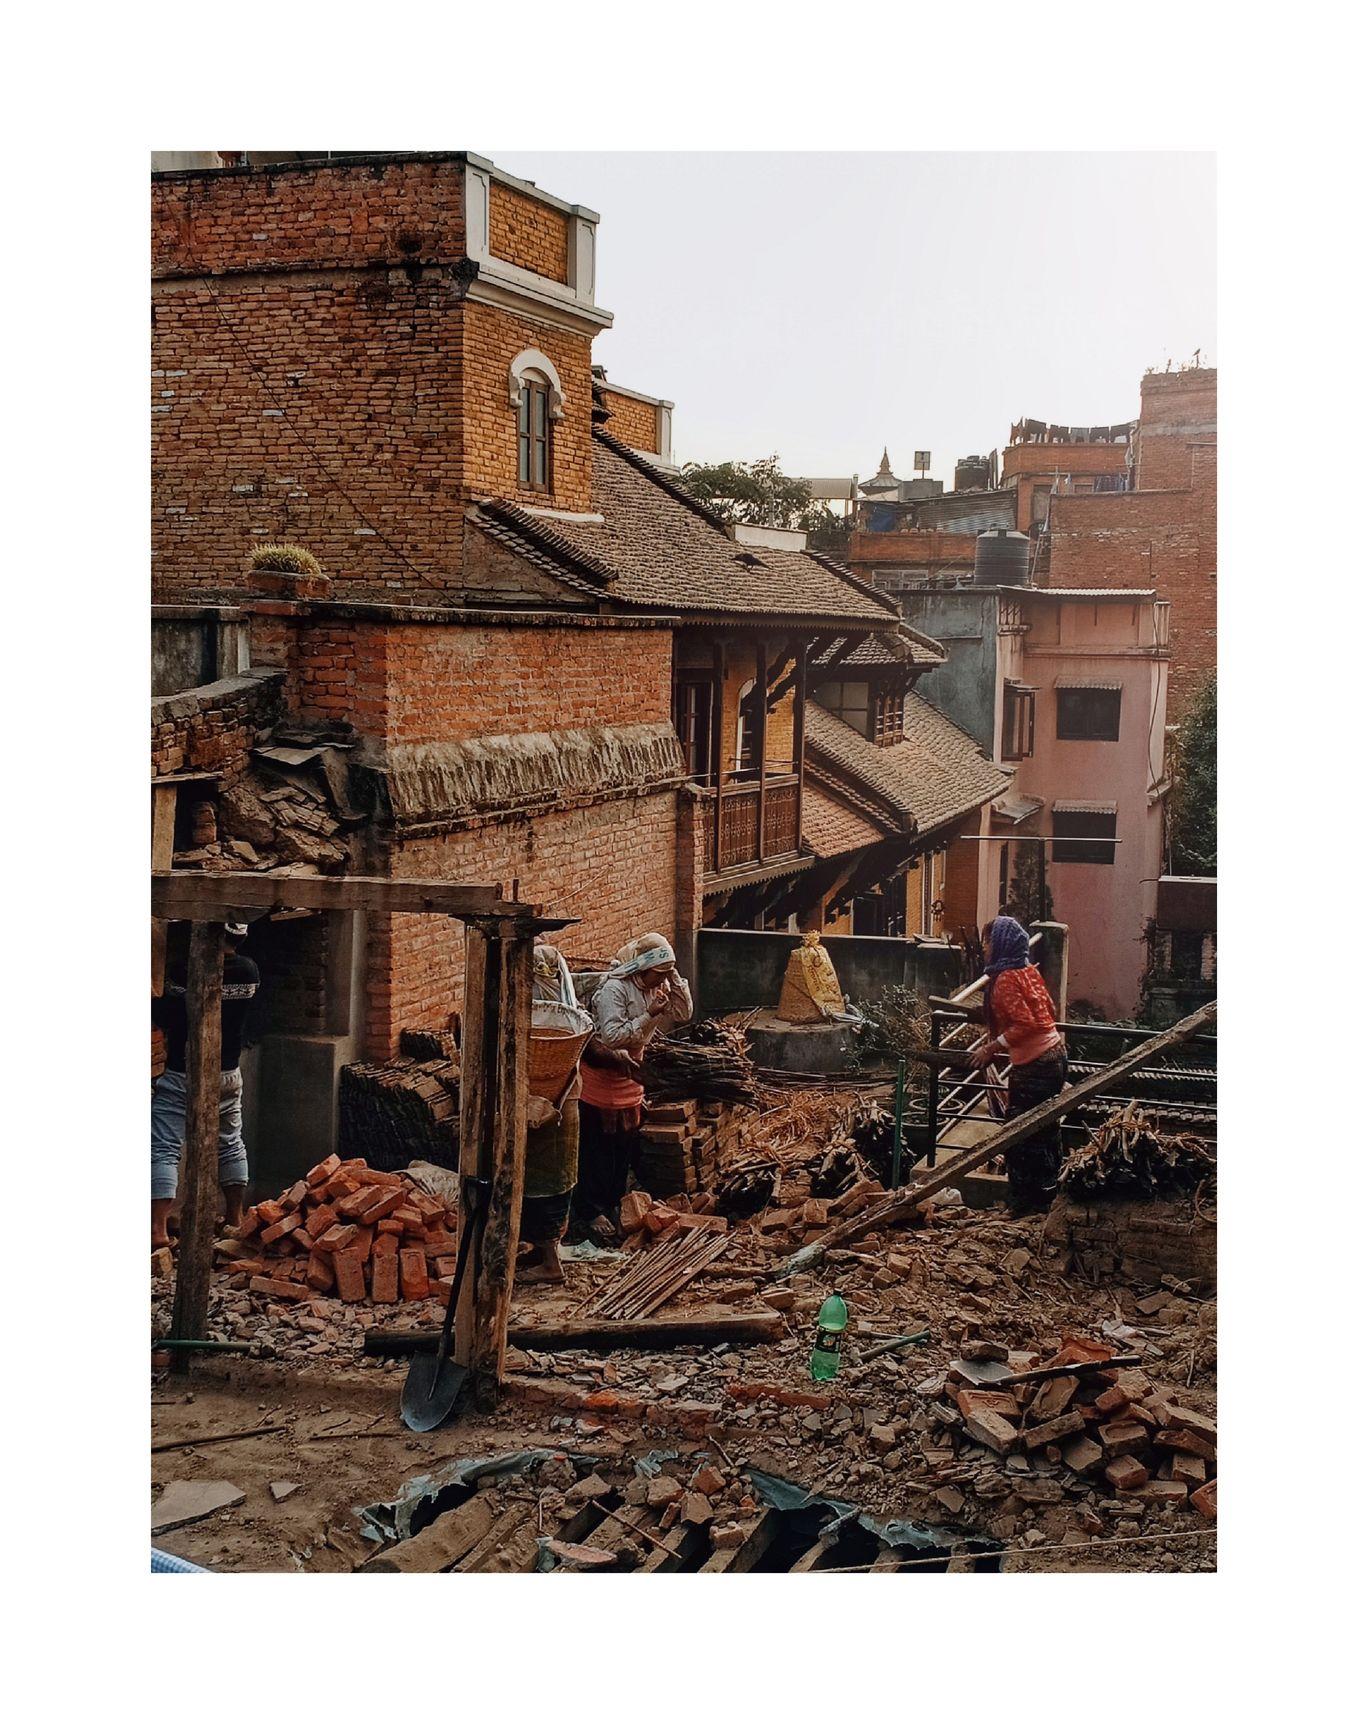 Photo of Nepal By Kiran Menon